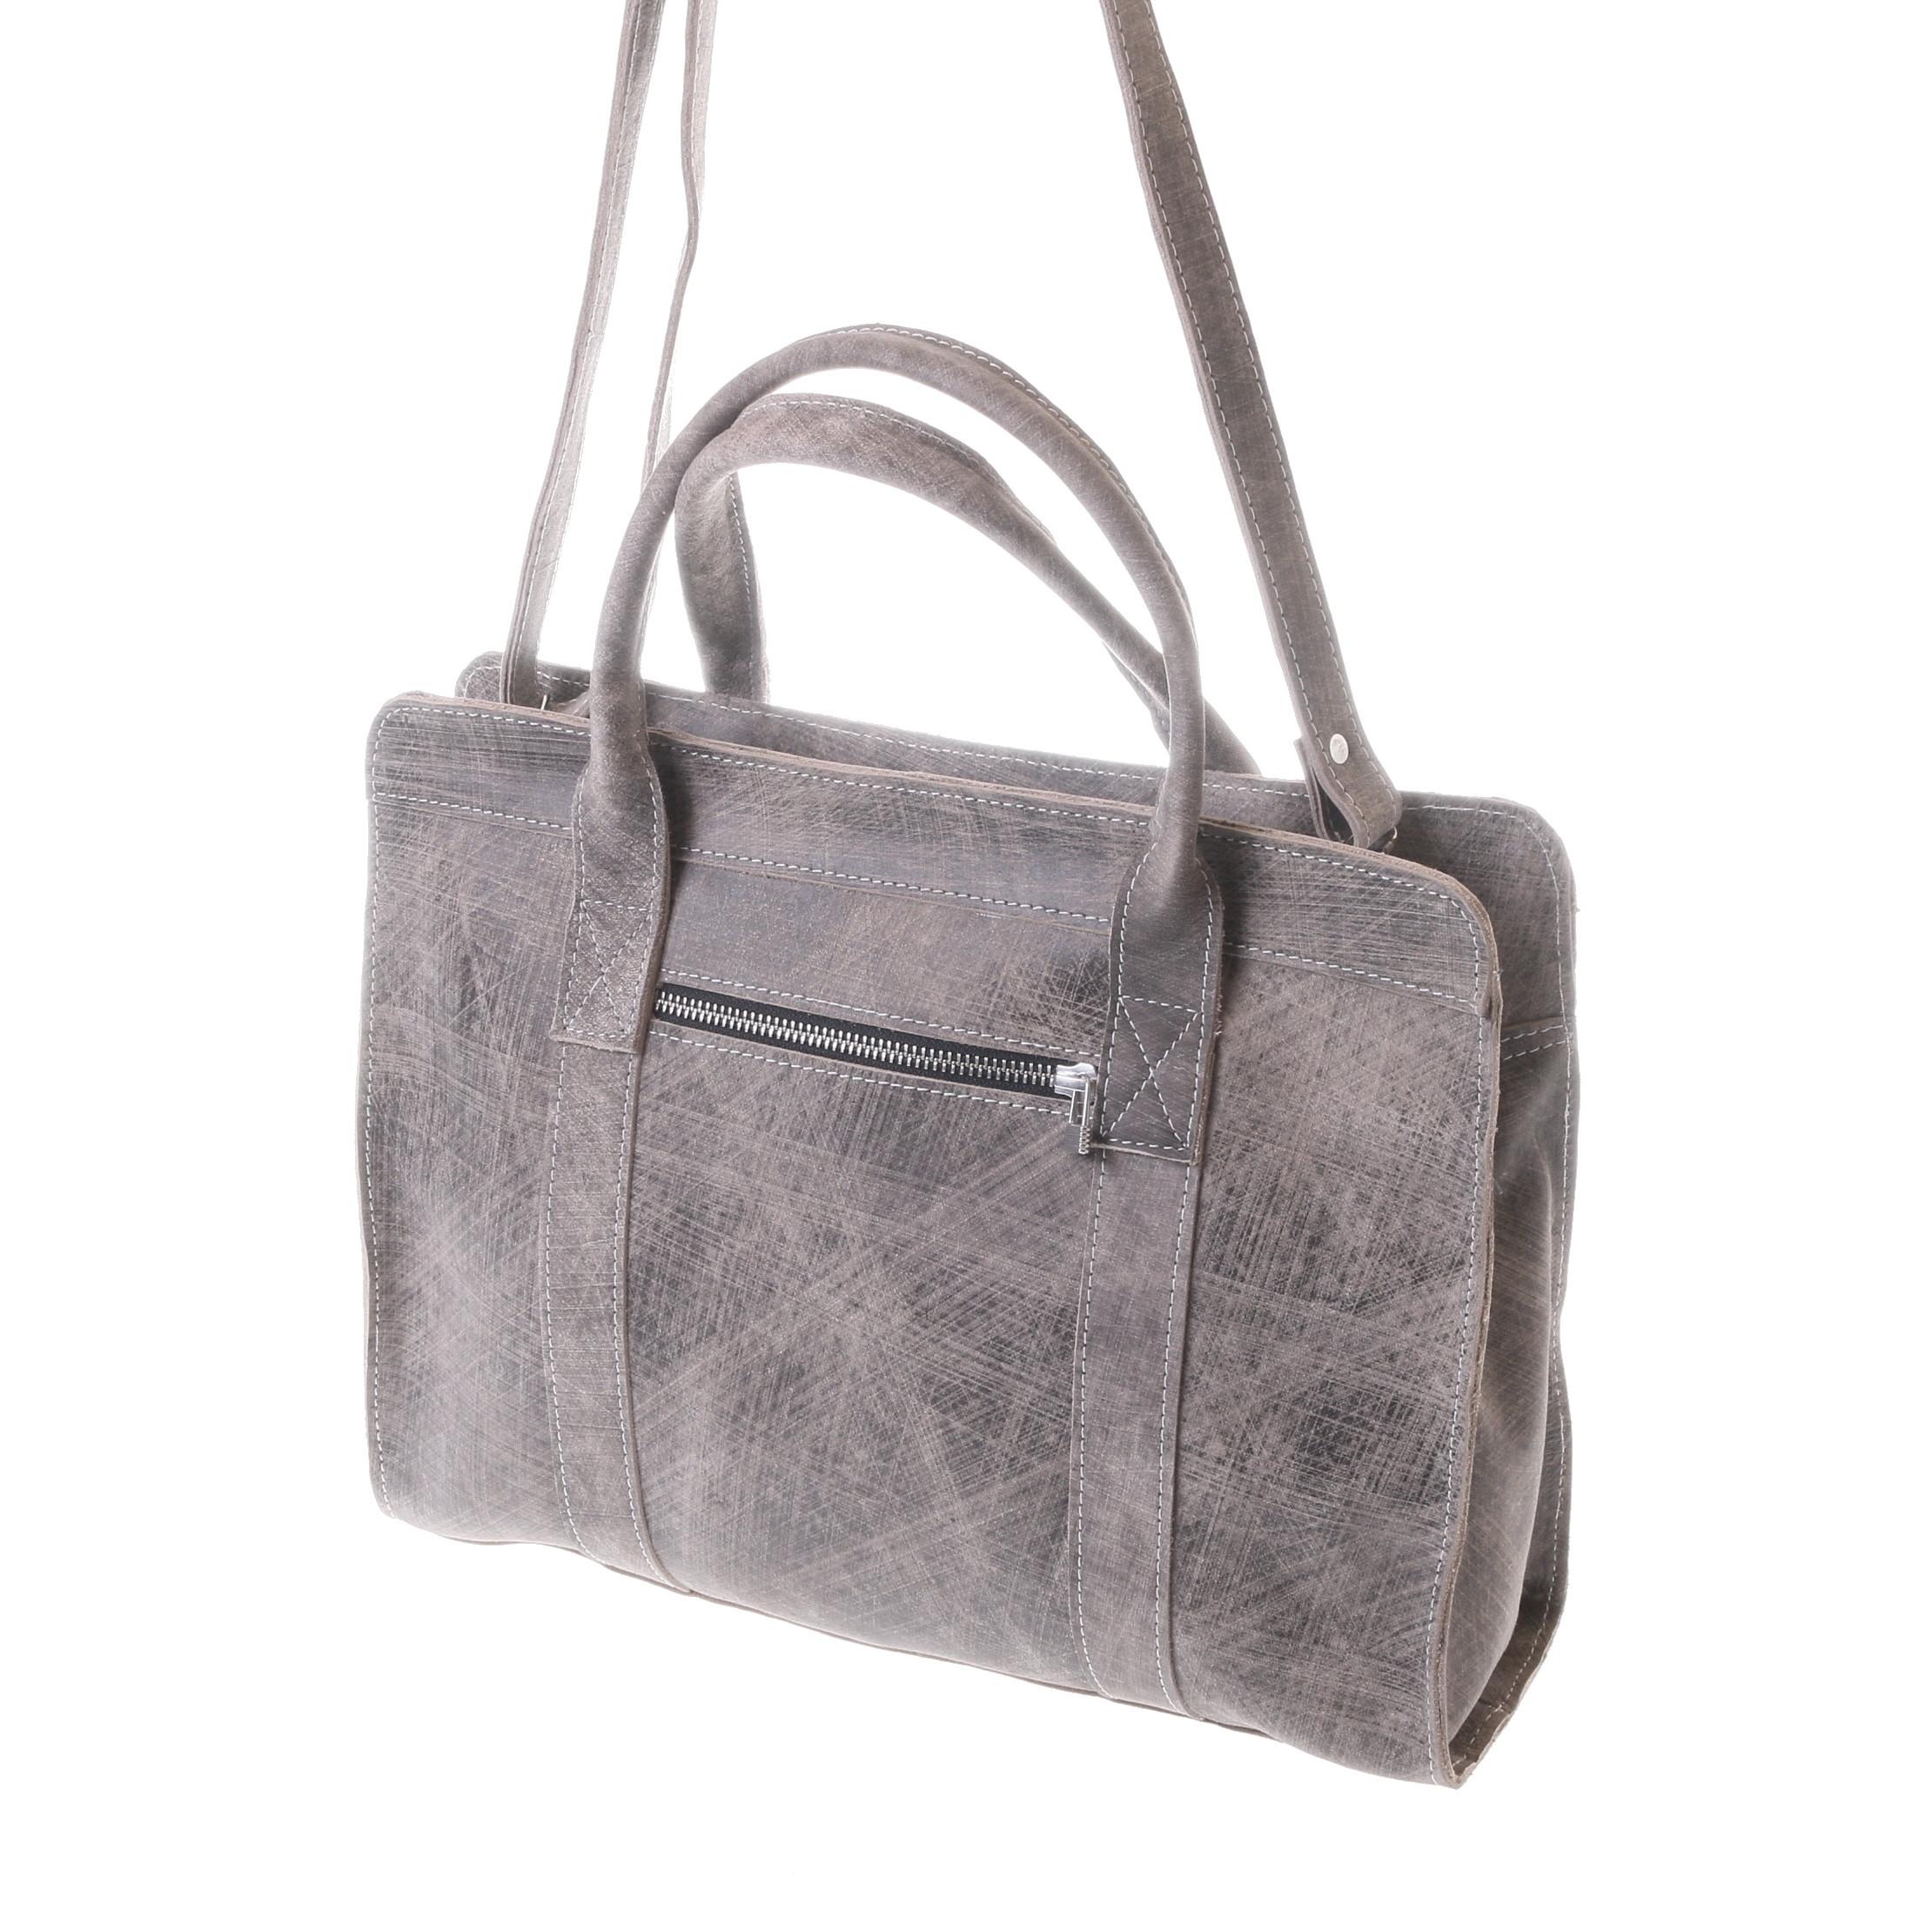 Gundara - fair grey-scratch leather bag from Ethiopia - fairchain and handmade